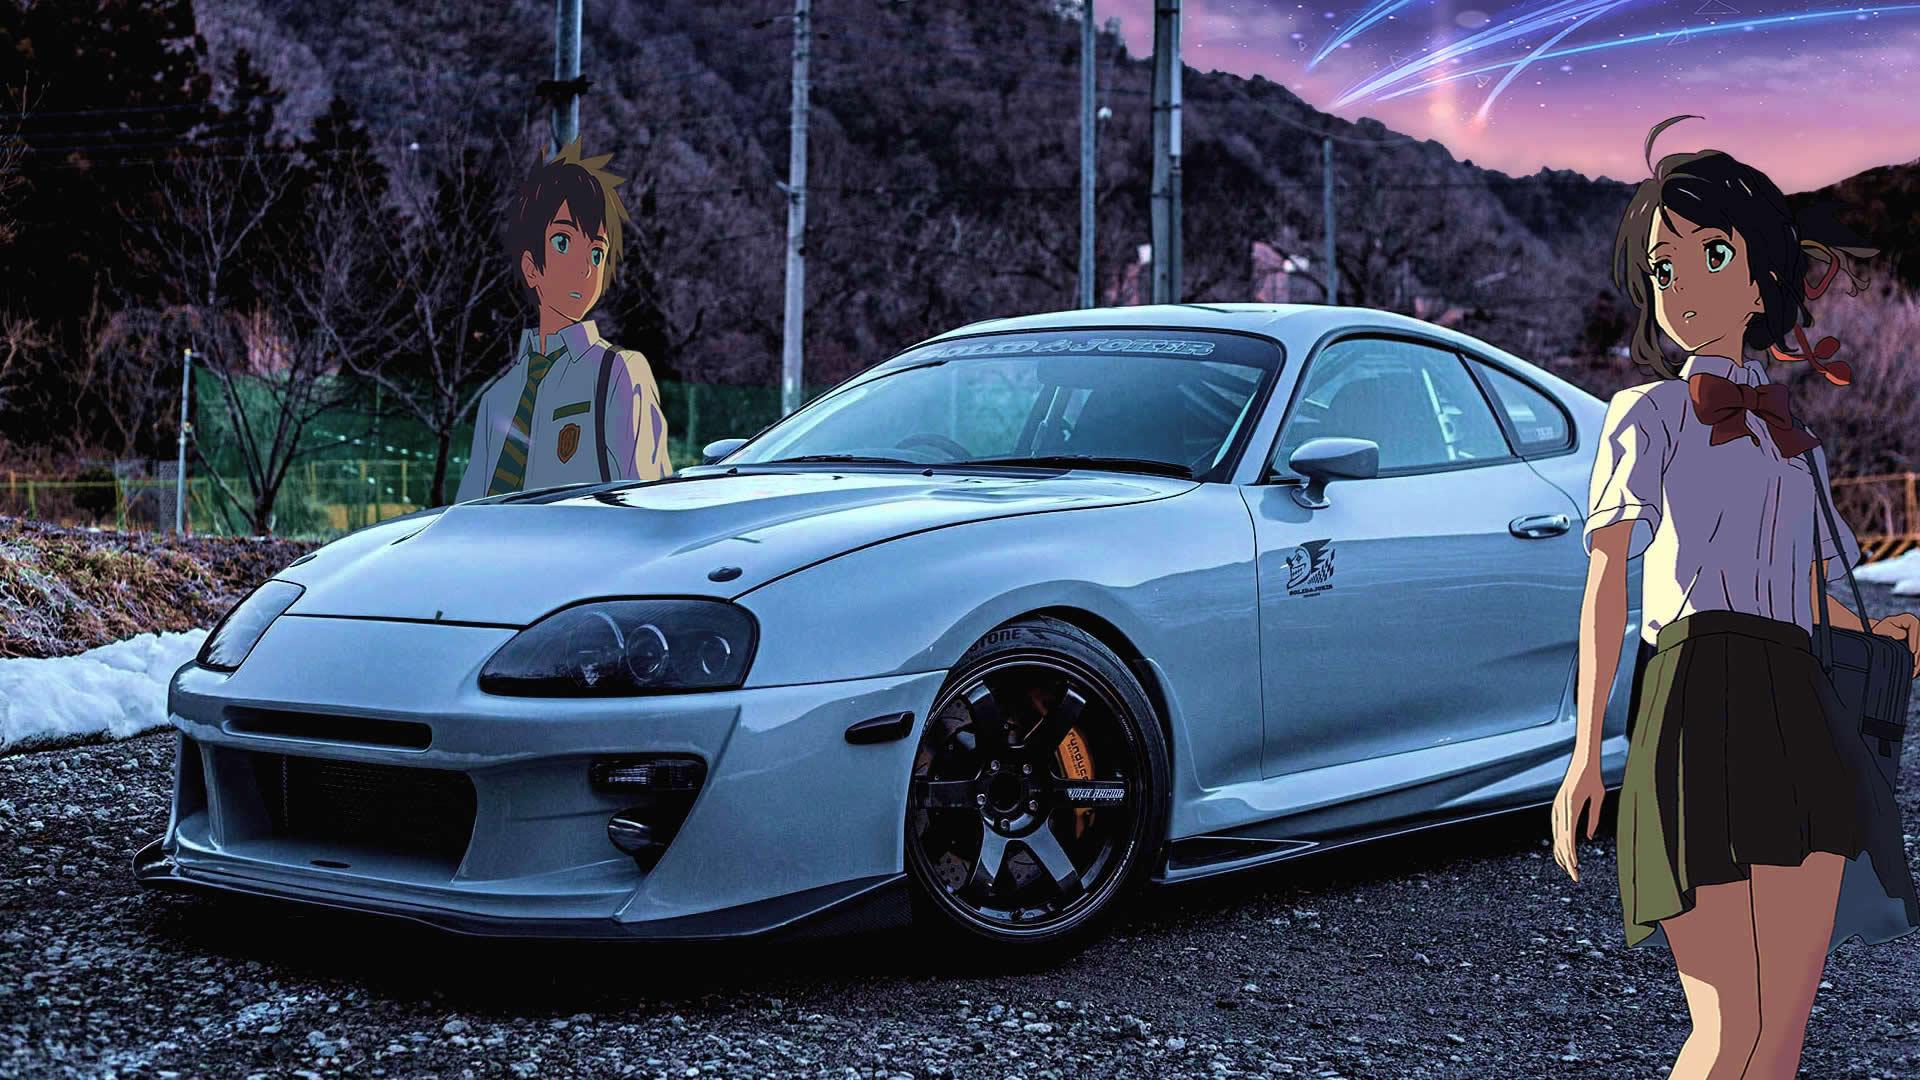 Wallpaper  JDM, Japanese cars, anime, Kimi no Na Wa, Itasha ...